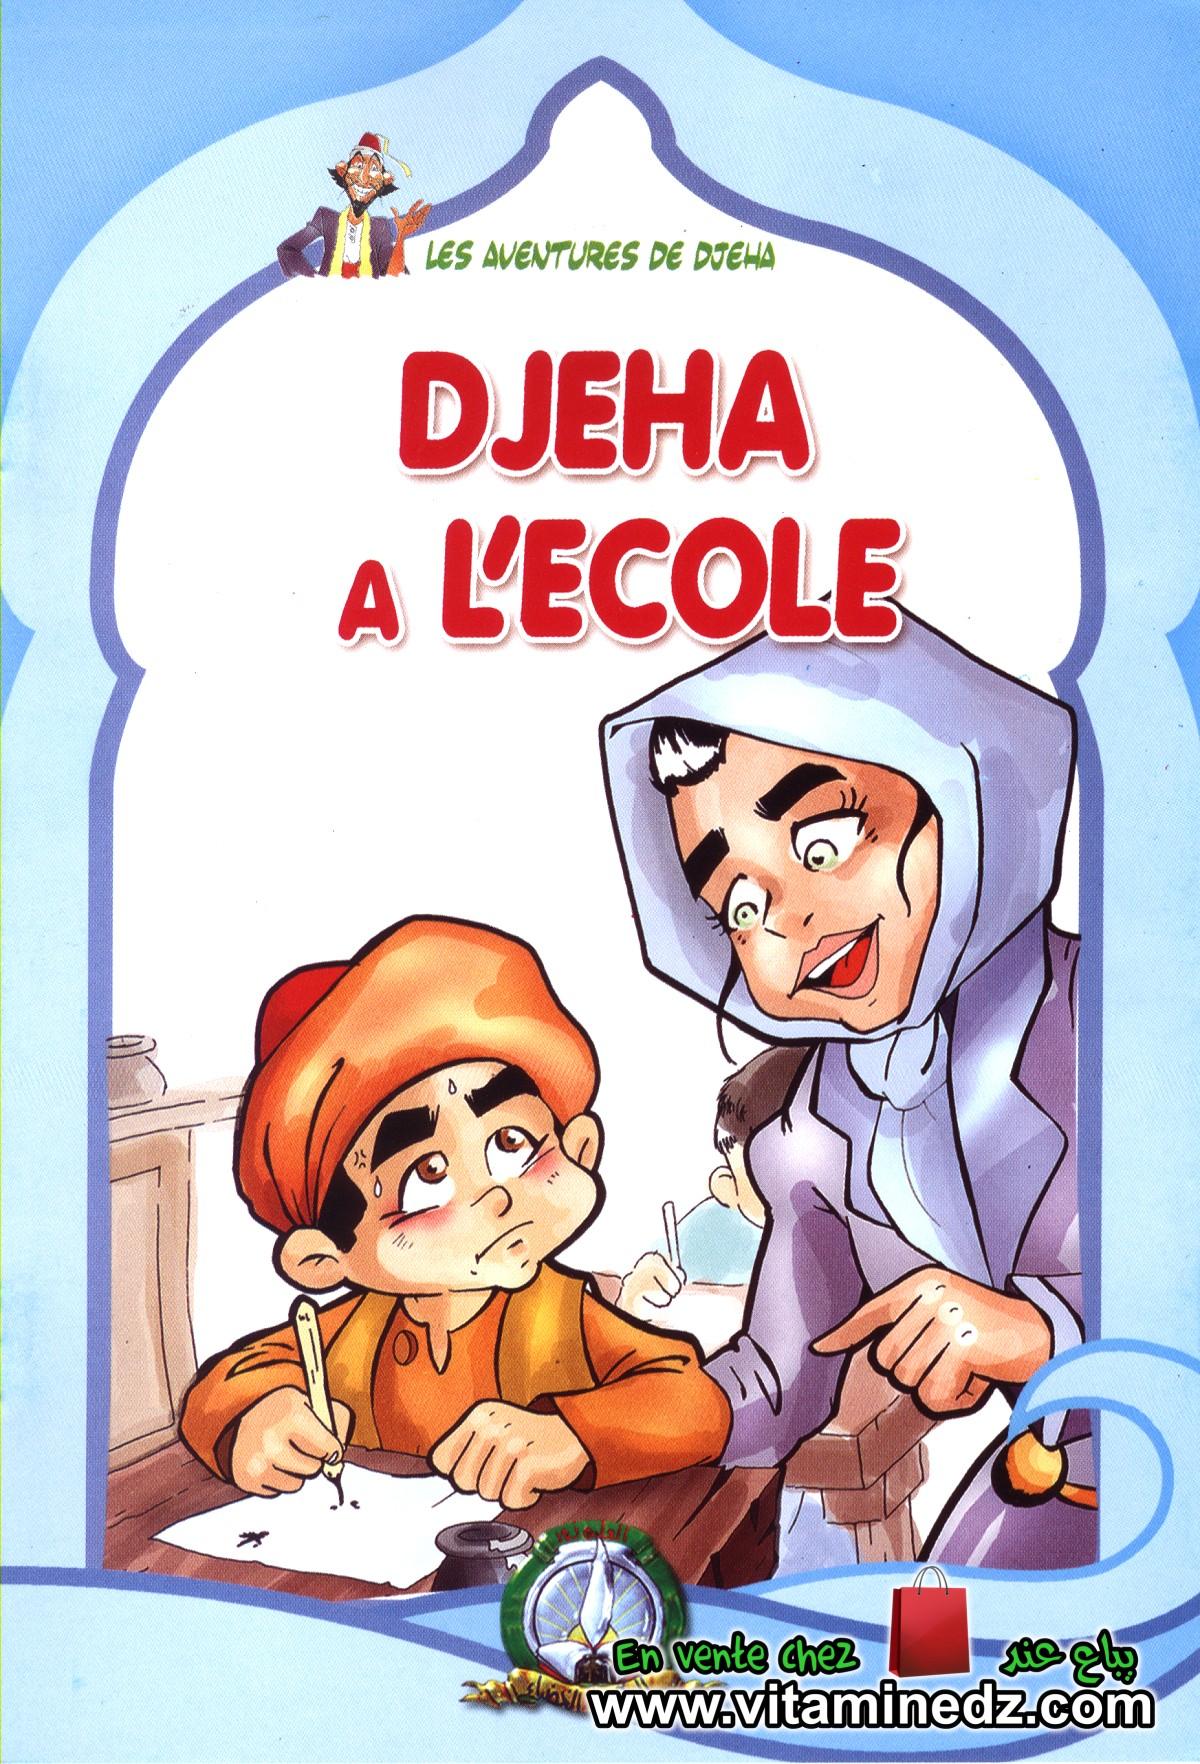 Les aventures de Djeha - Djeha à l'école